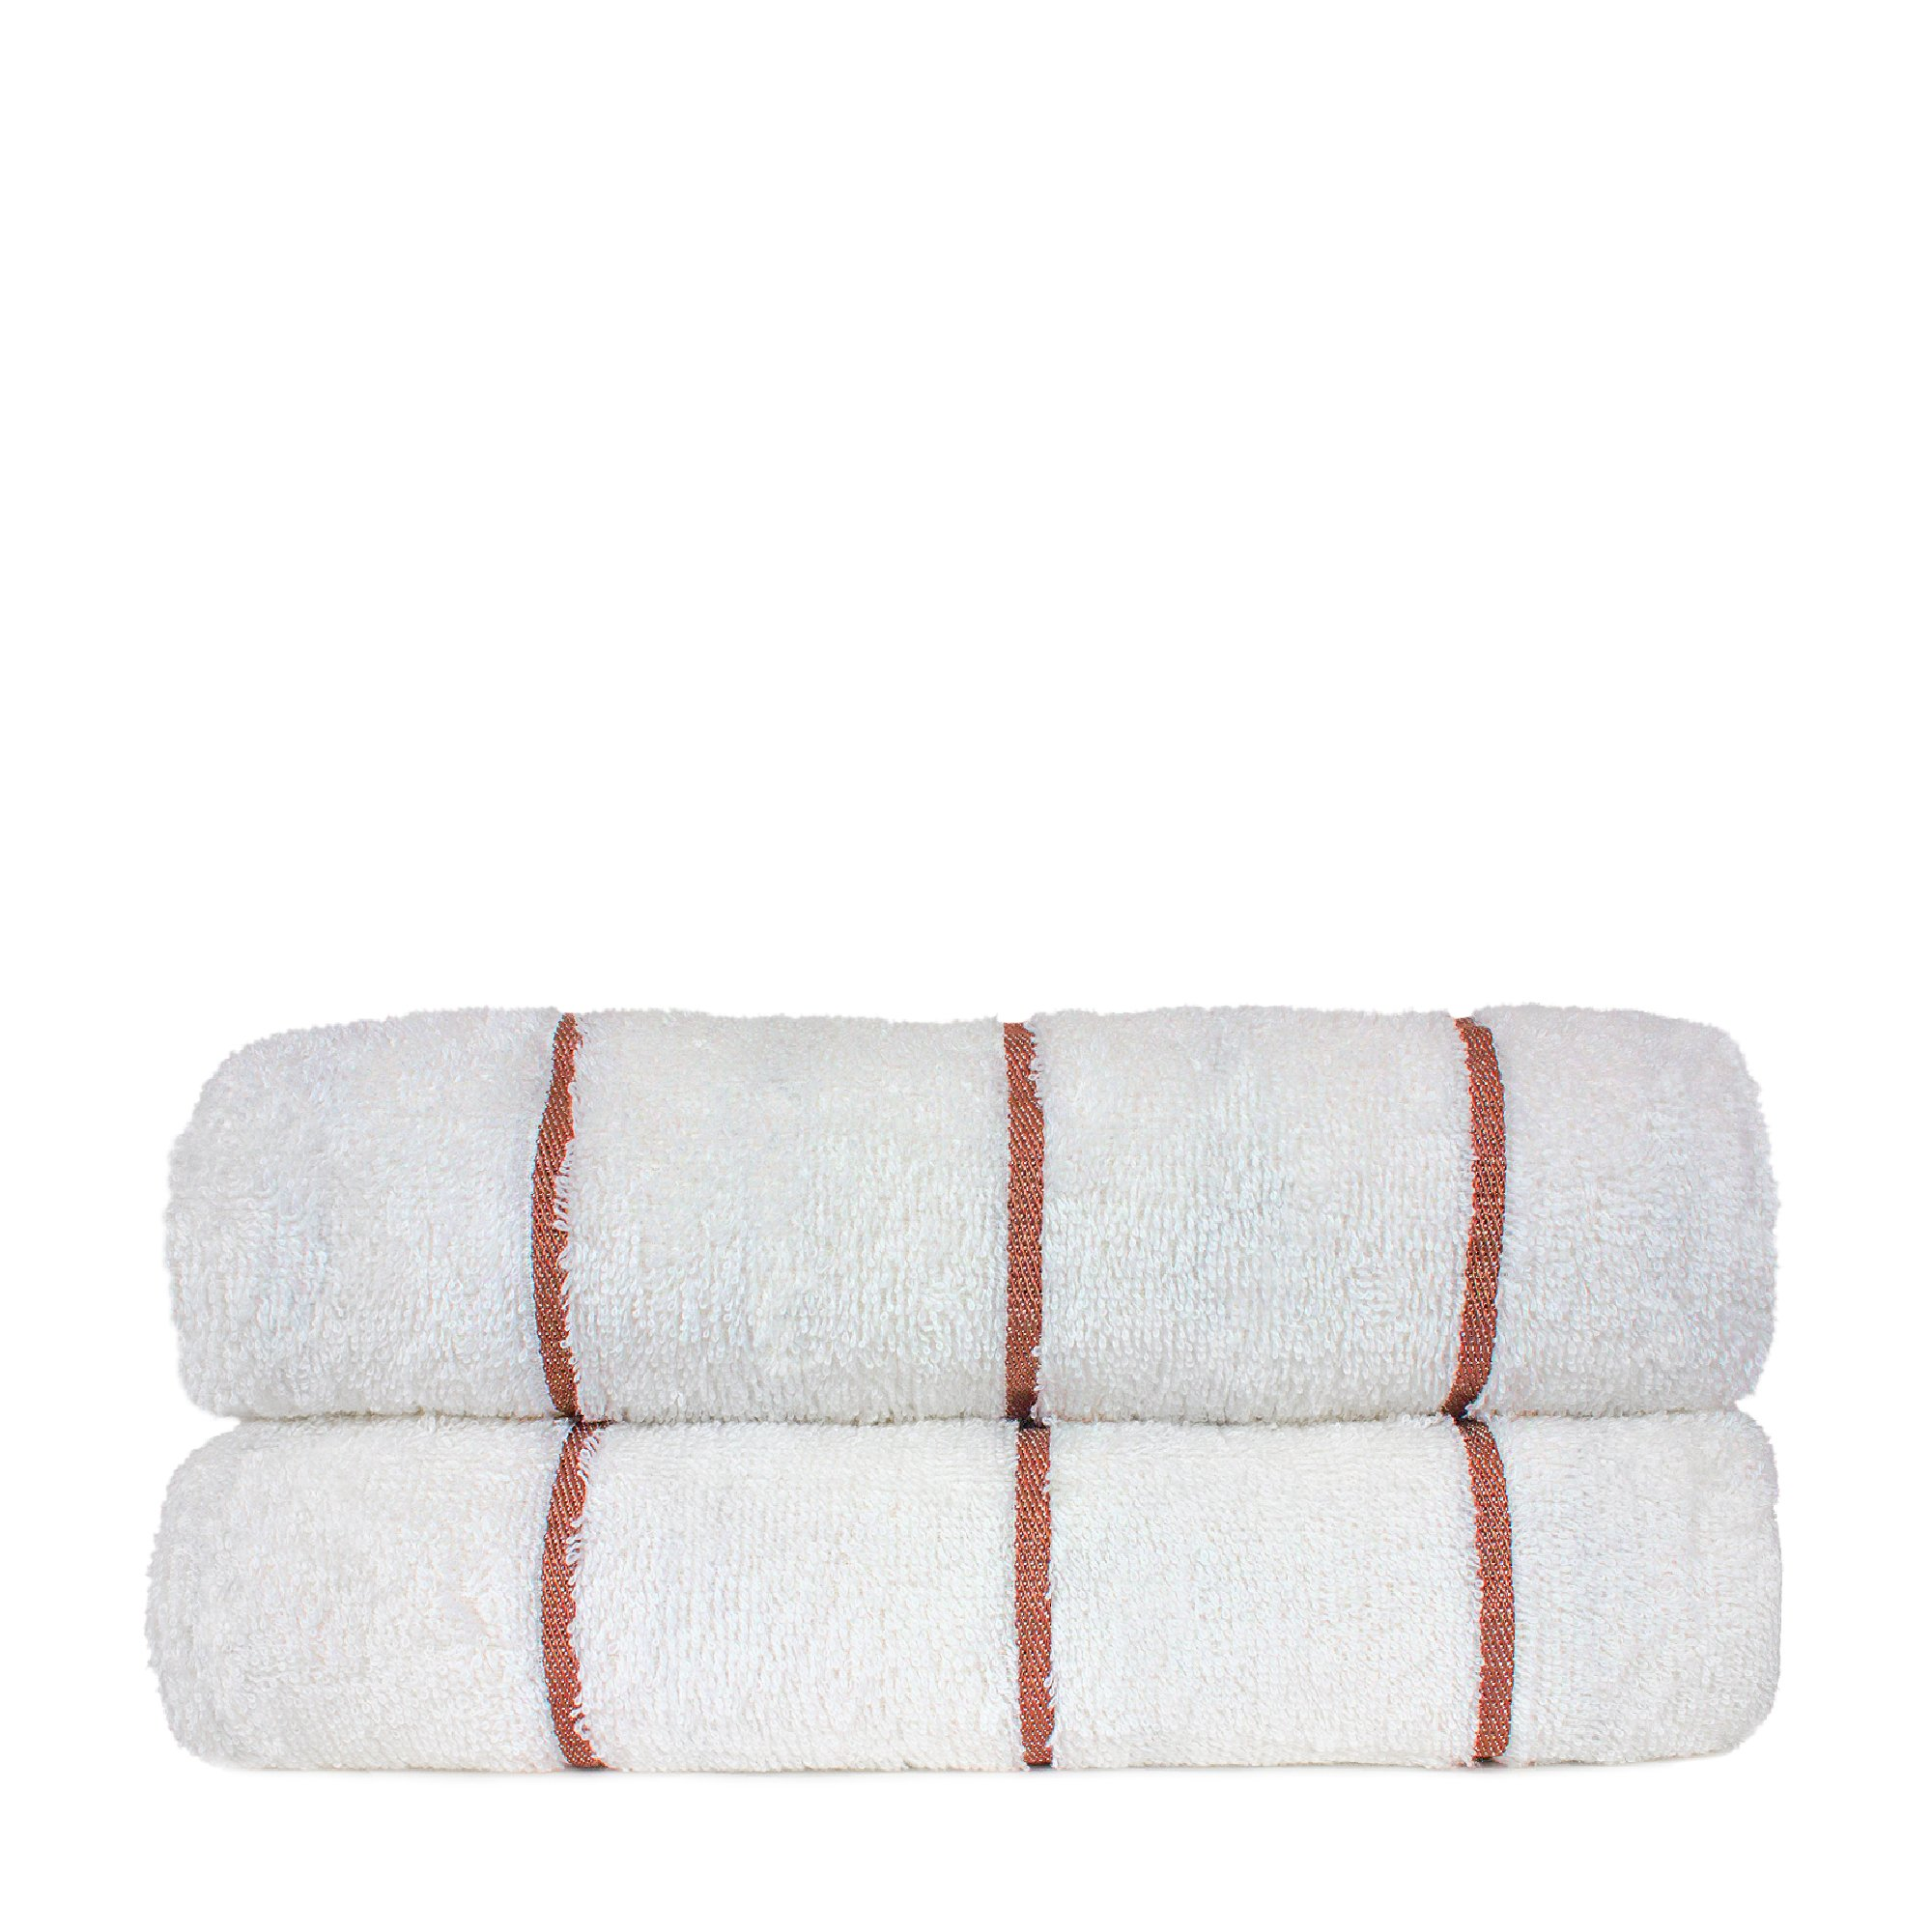 Luxury Hotel Towel Turkish Cotton Extra Large Pool-Beach Towel Set (Set of 2, Brick Red) by Chakir Turkish Linens